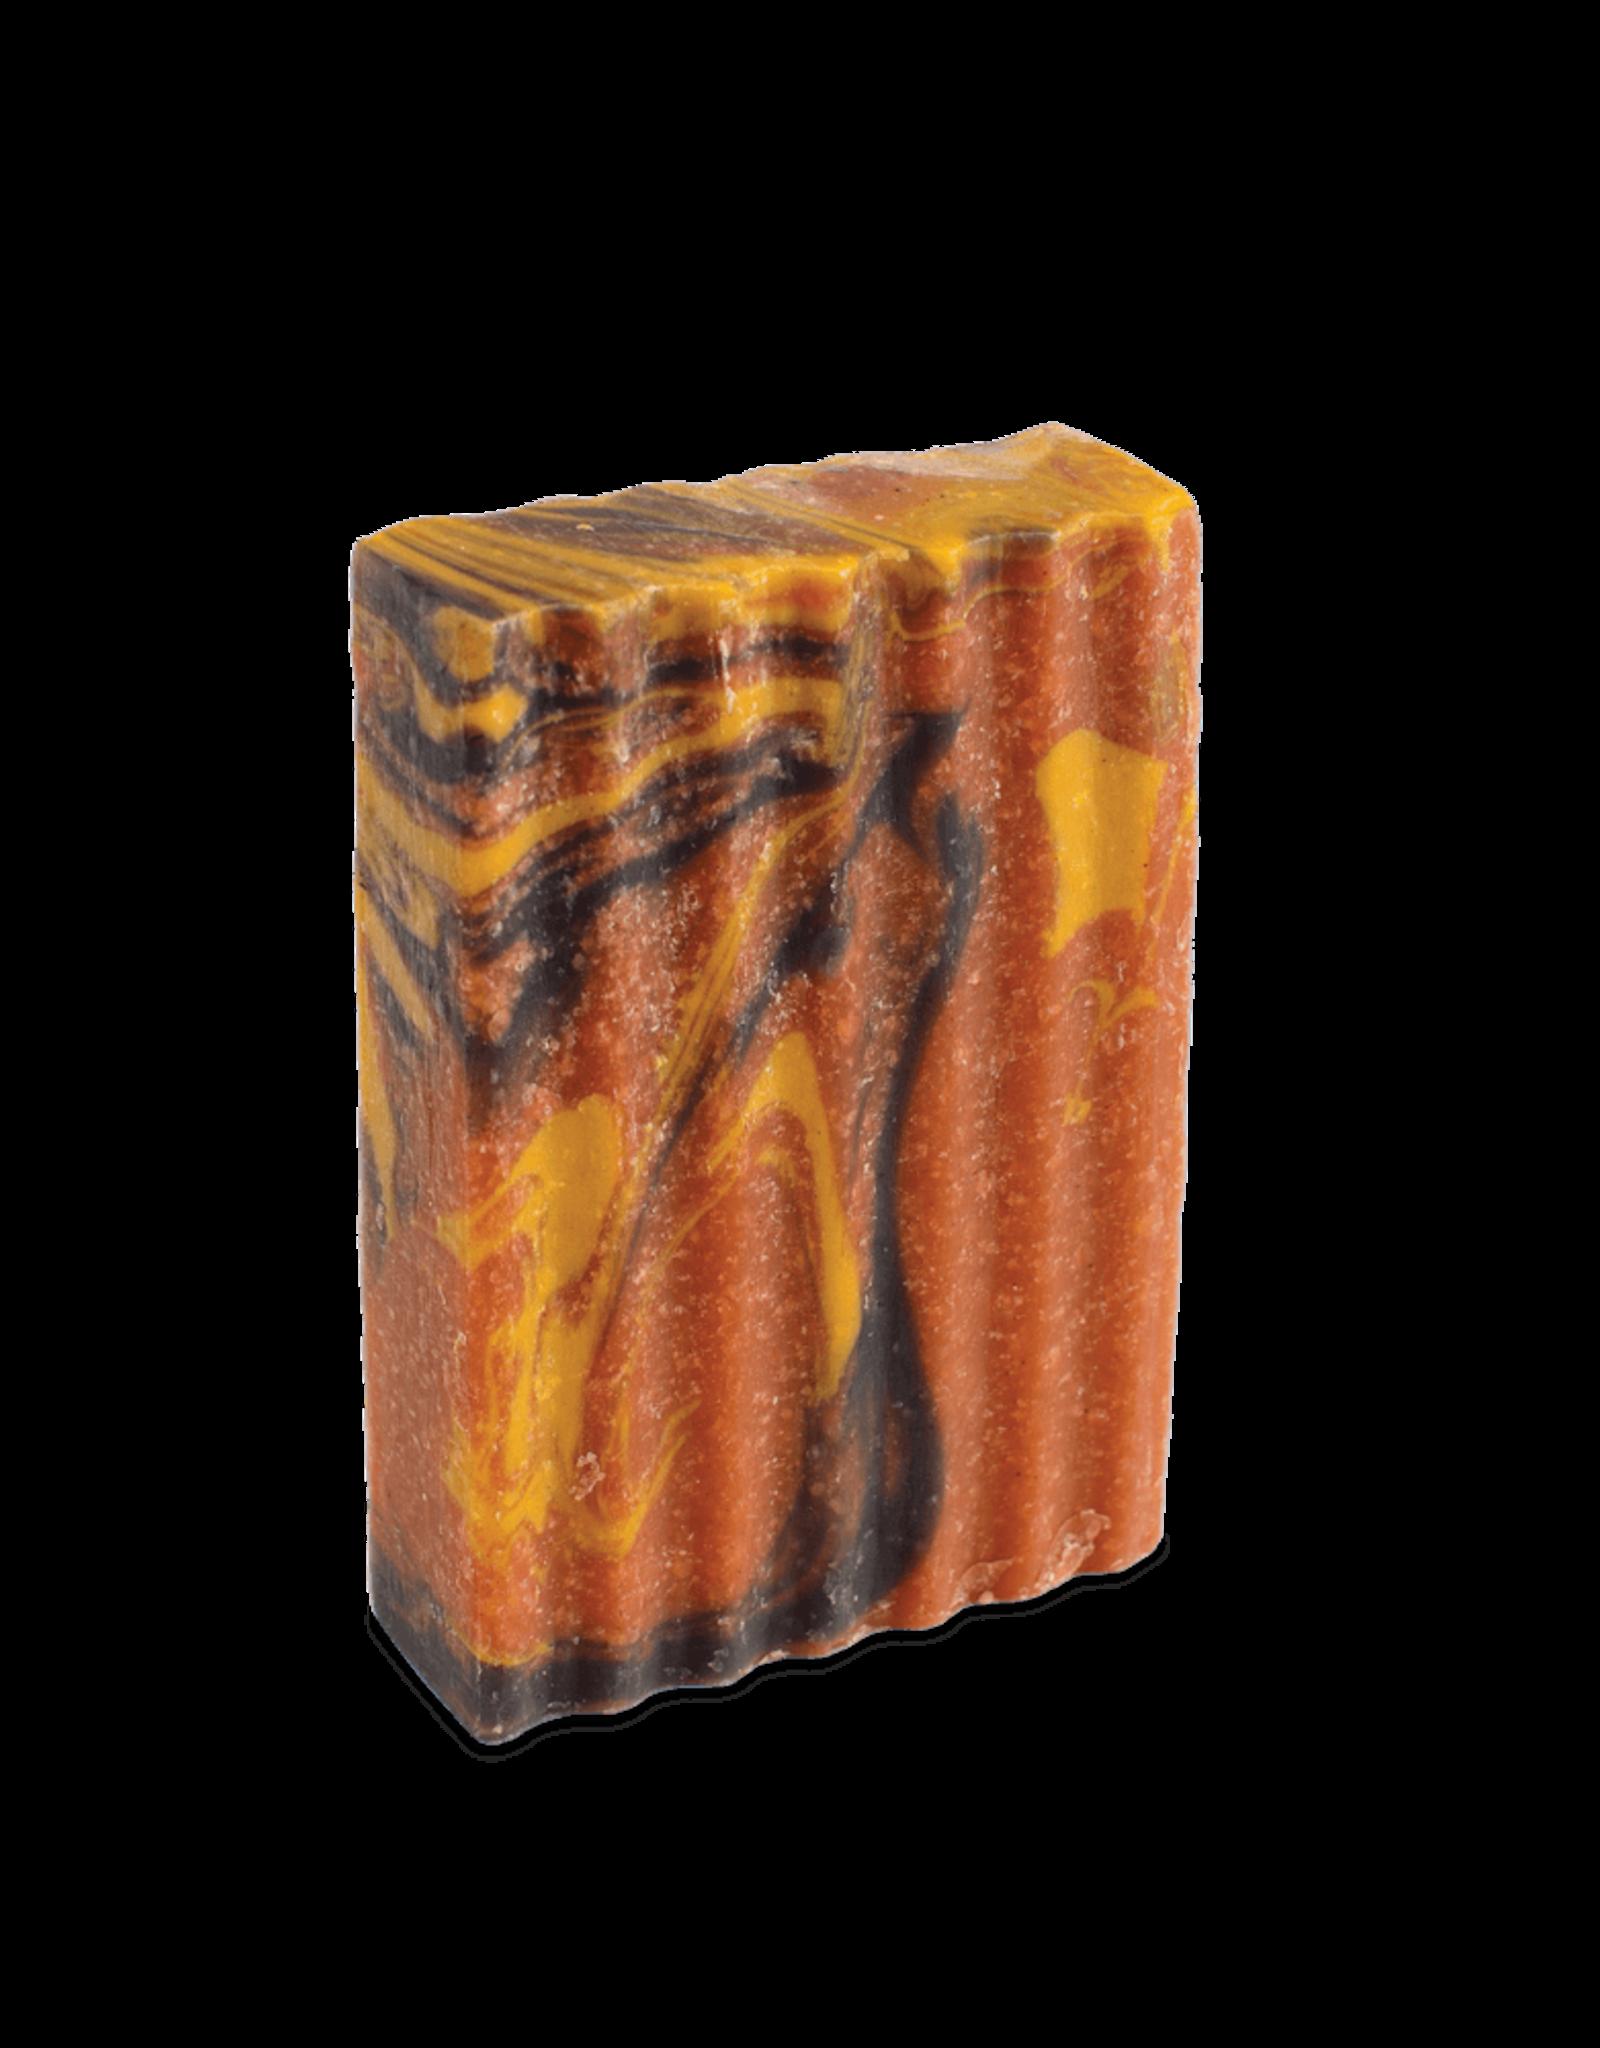 Indigo Wild Dragon's Blood Goat Milk Soap